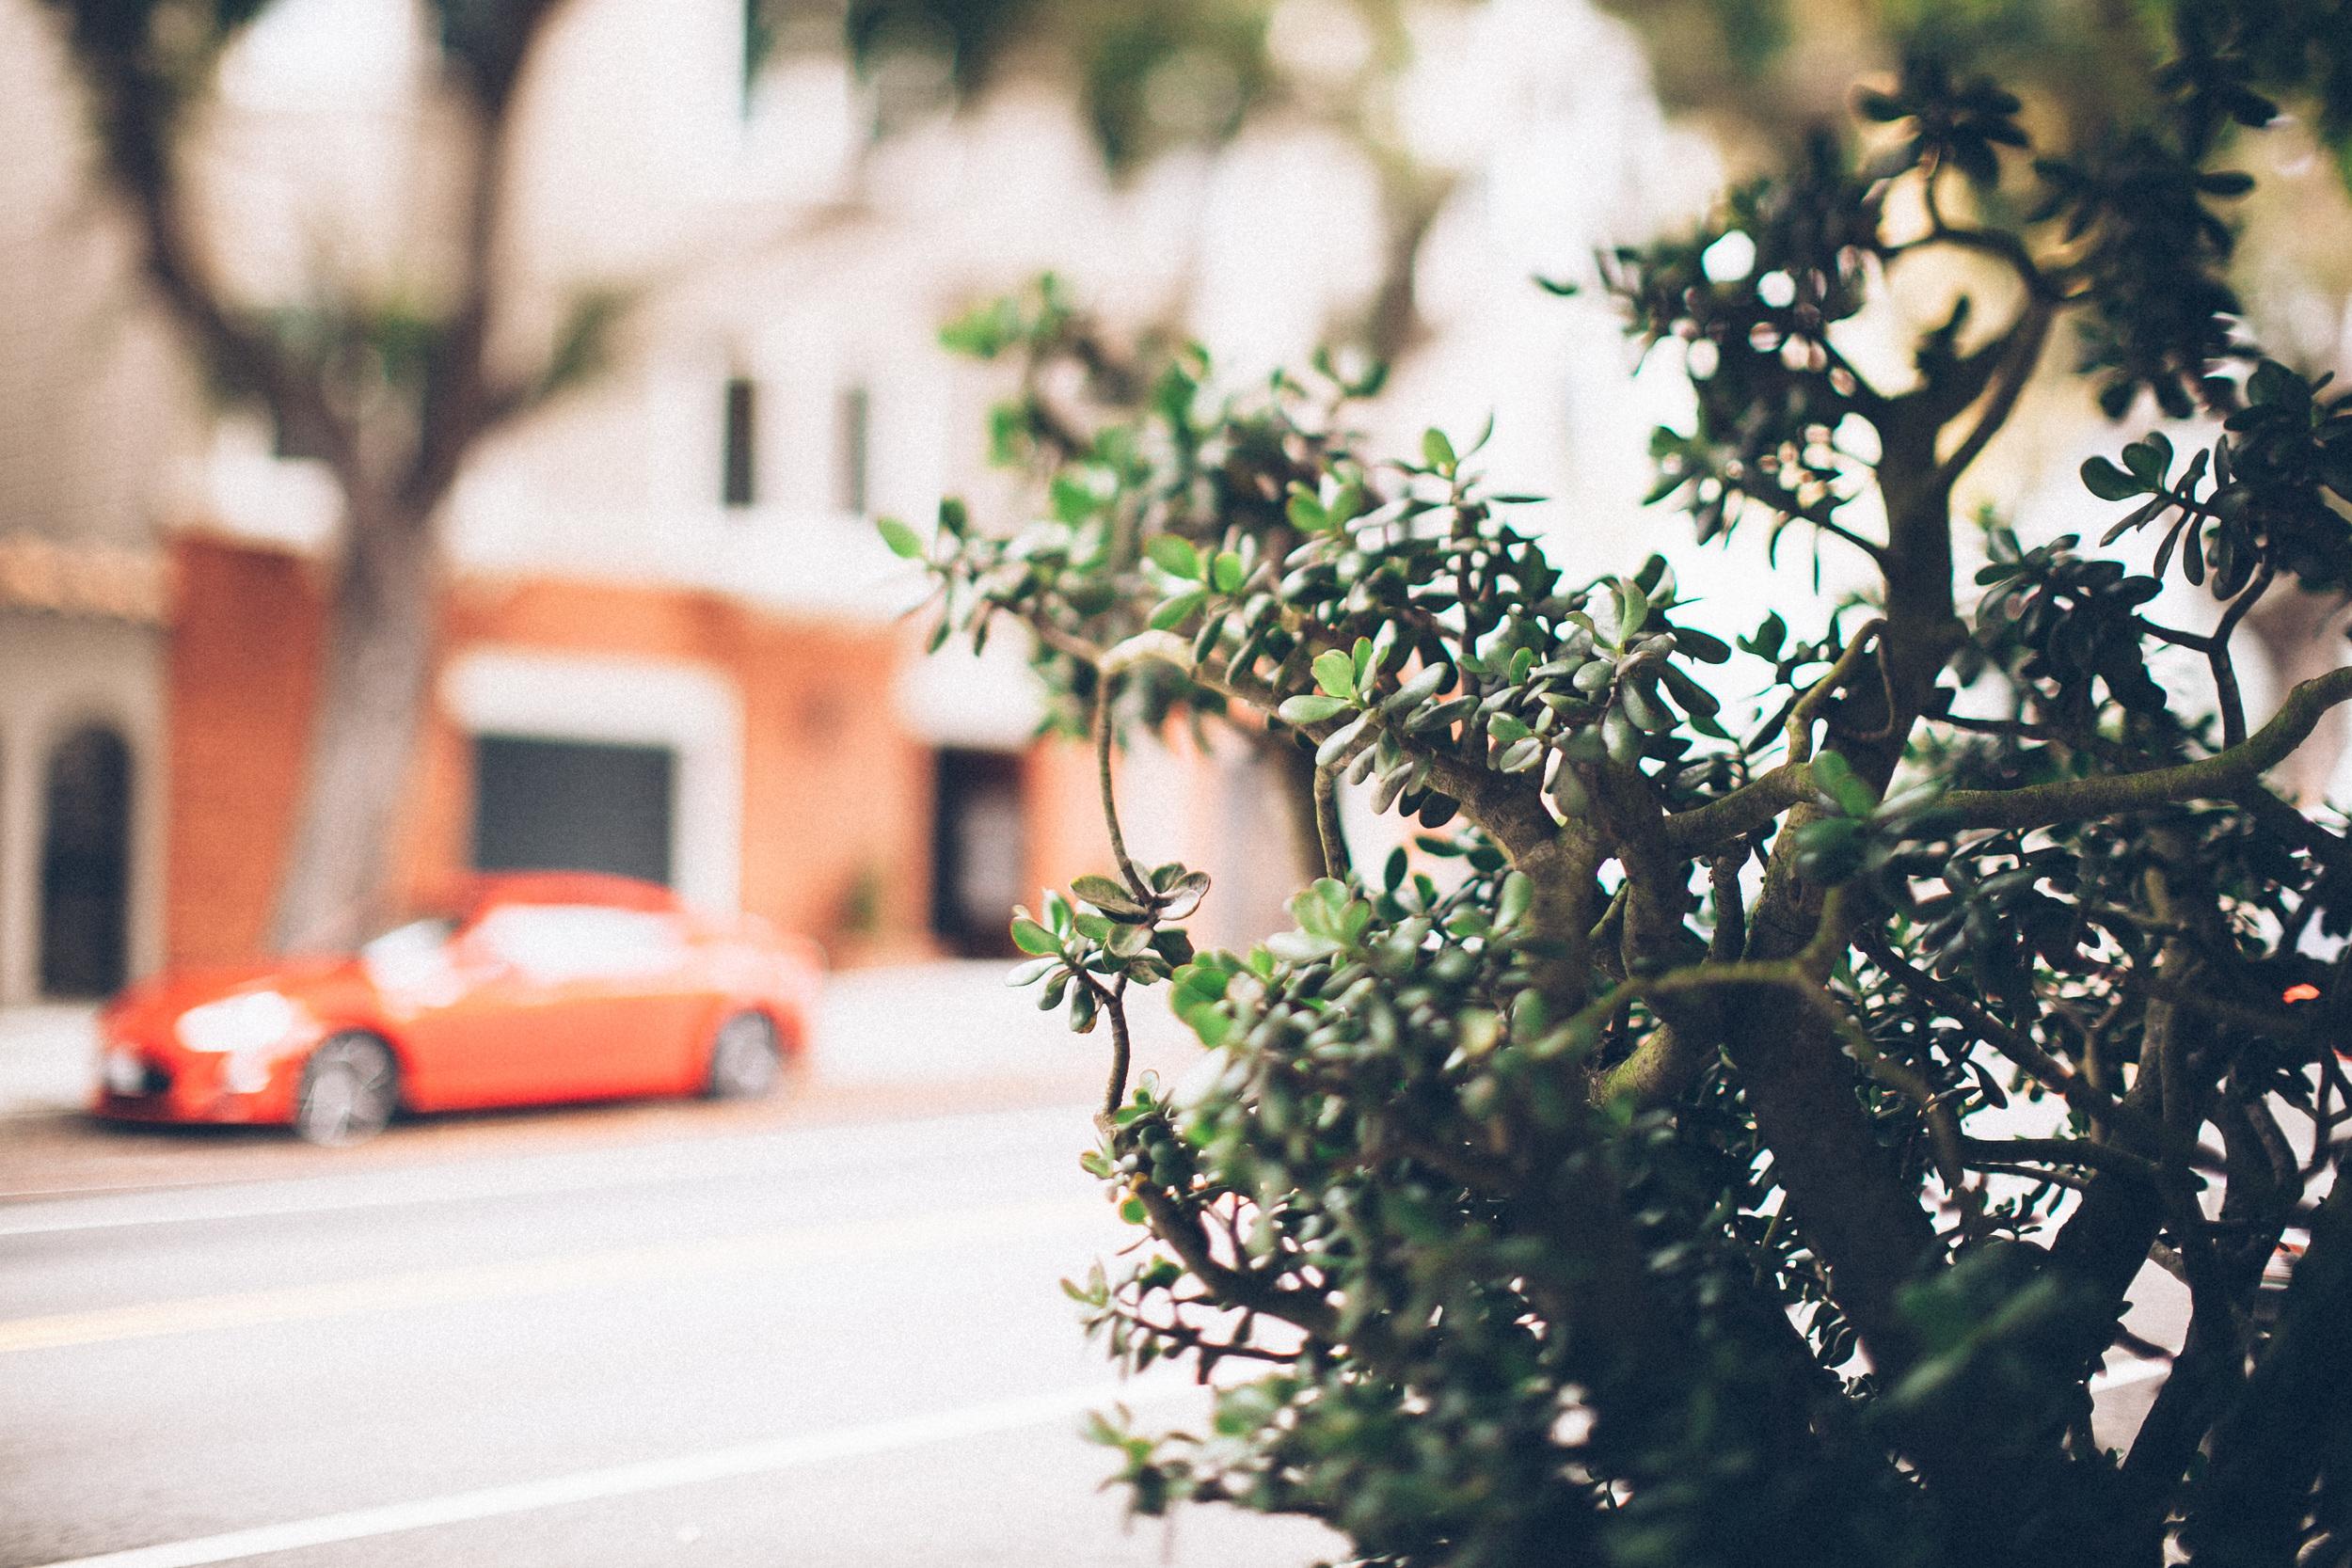 sanfrancisco-0982.jpg